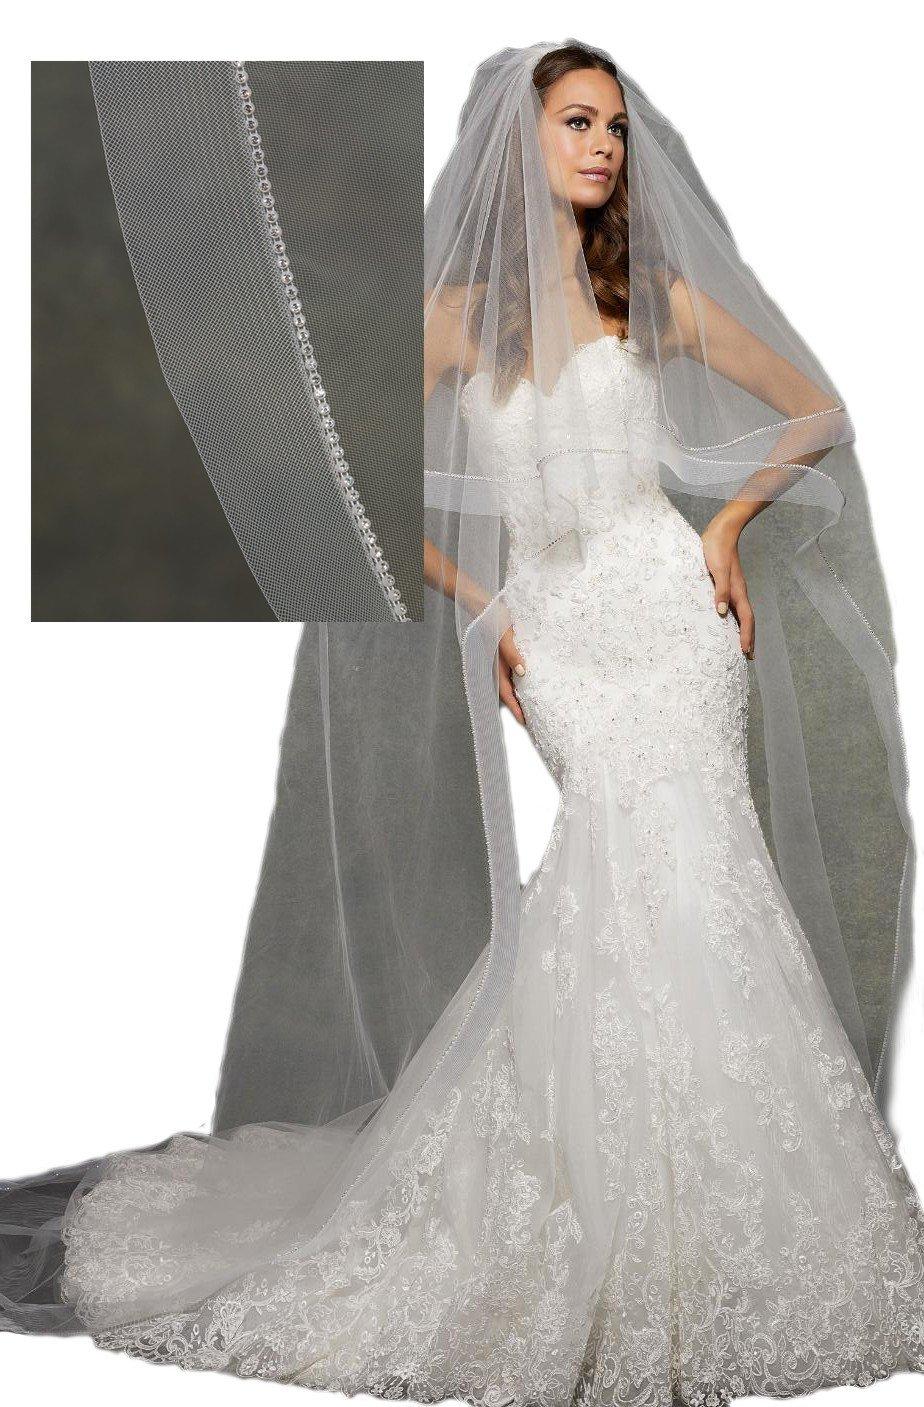 Passat Diamond White Single-Tier 3M Cathedral Wedding Bridal Veil Circular Veil Edged with Rhinestones and Horsehair VL1055